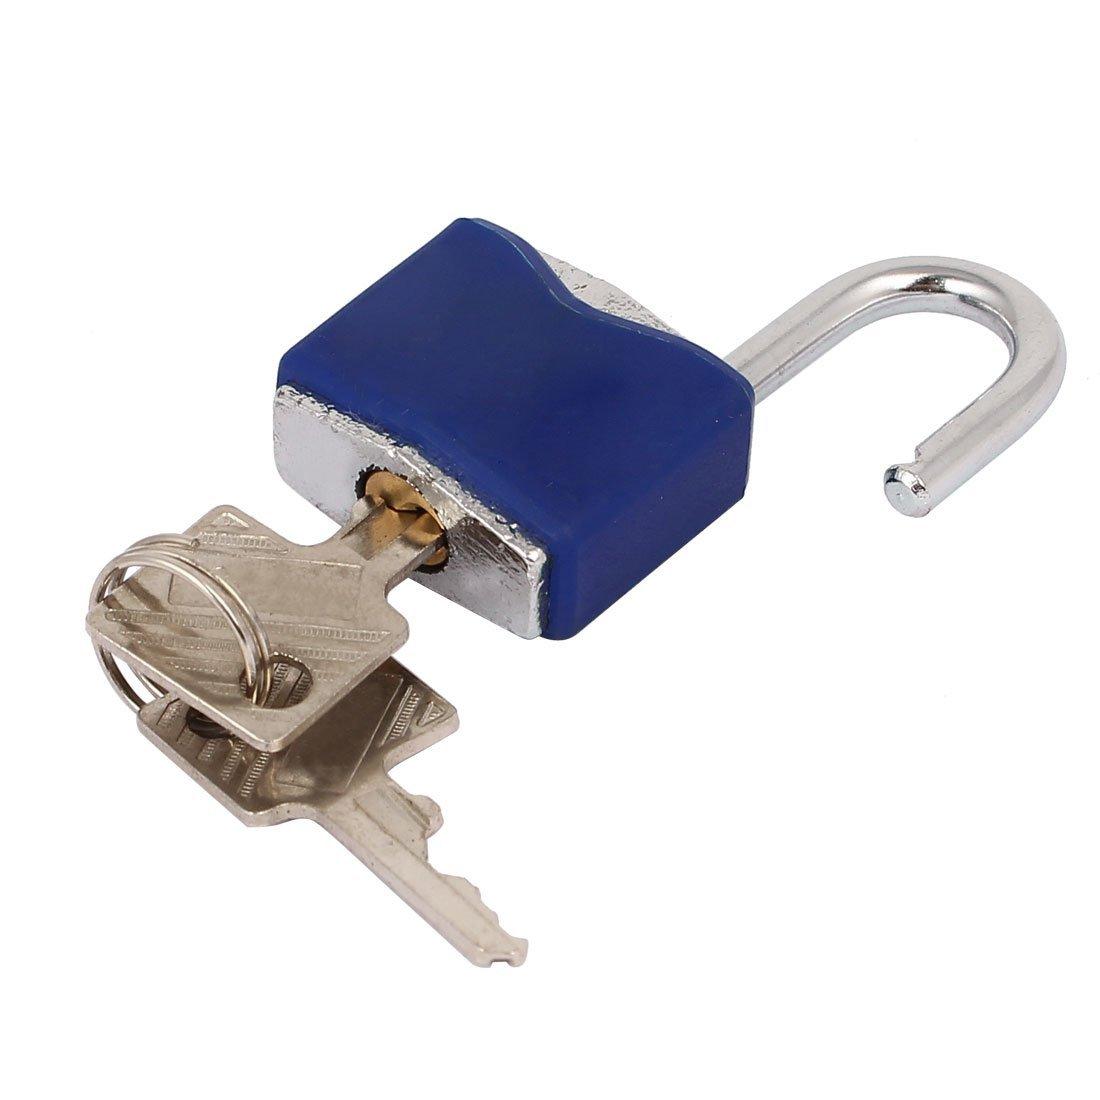 eDealMax herramienta caja del cajón 42mmx28mmx15mm la seguridad del metal Candado Locker W Keys - - Amazon.com